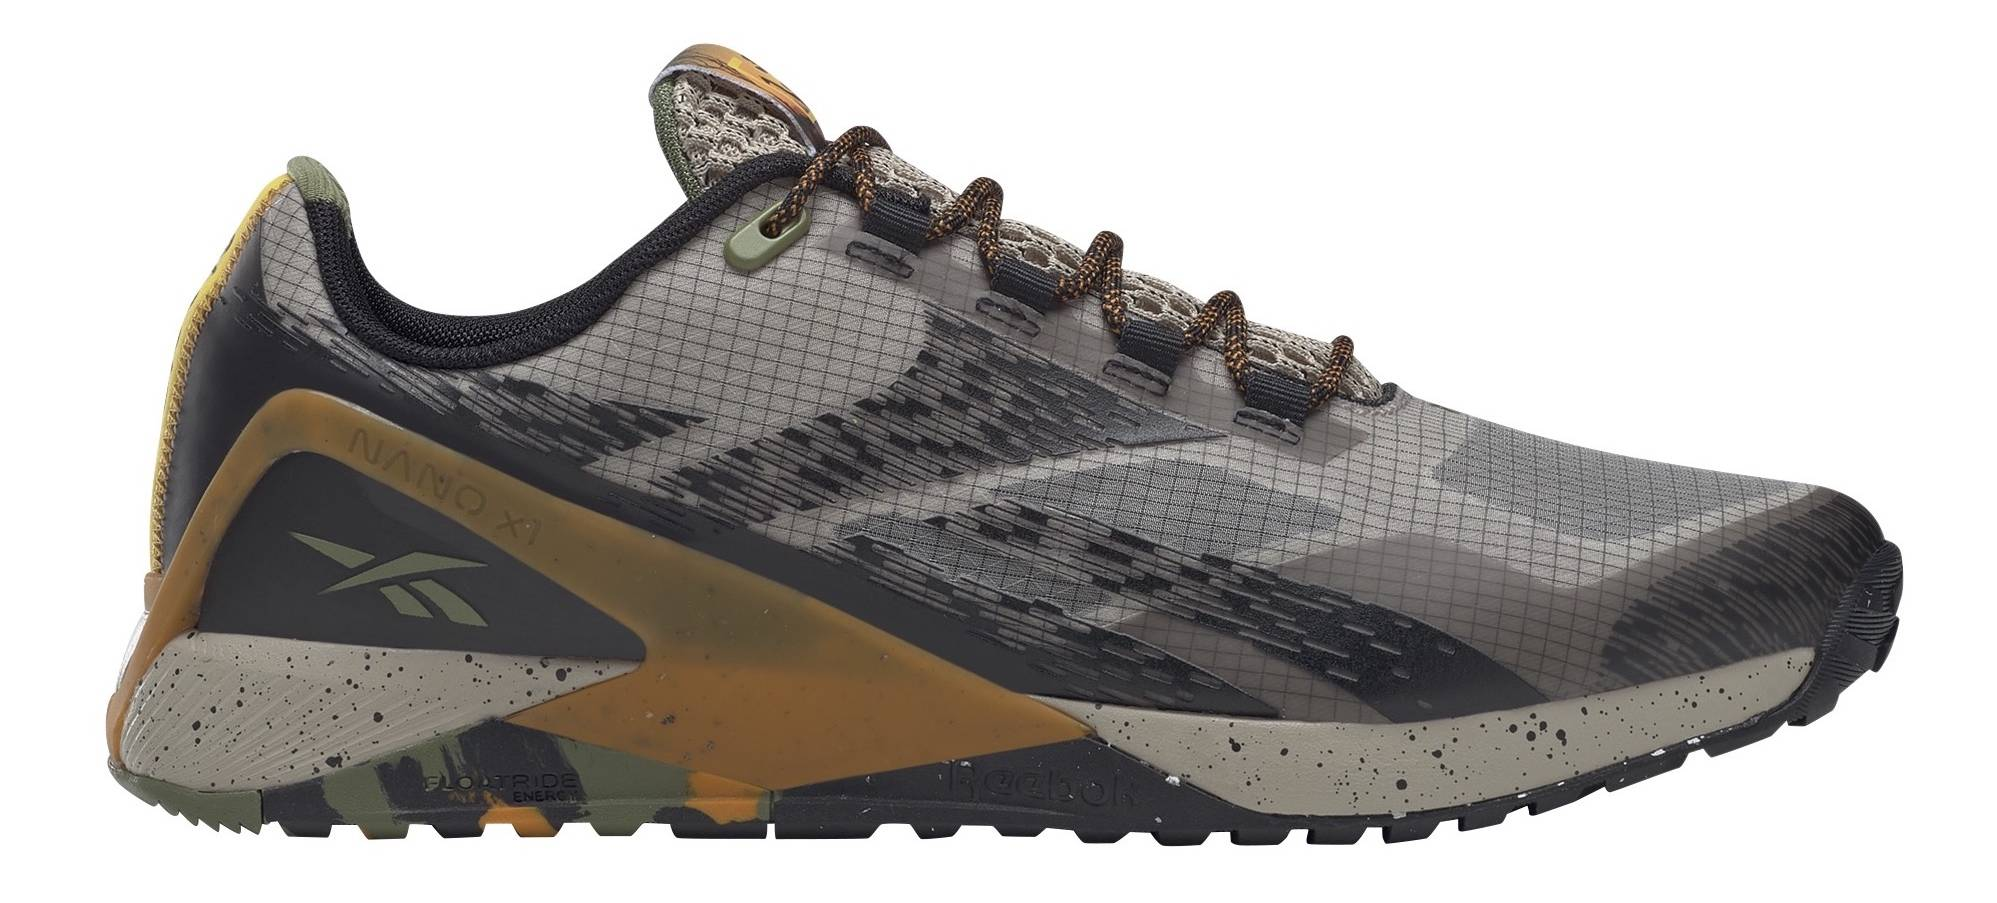 Reebok nano x1 adventure safari-style Nat Geo shoe